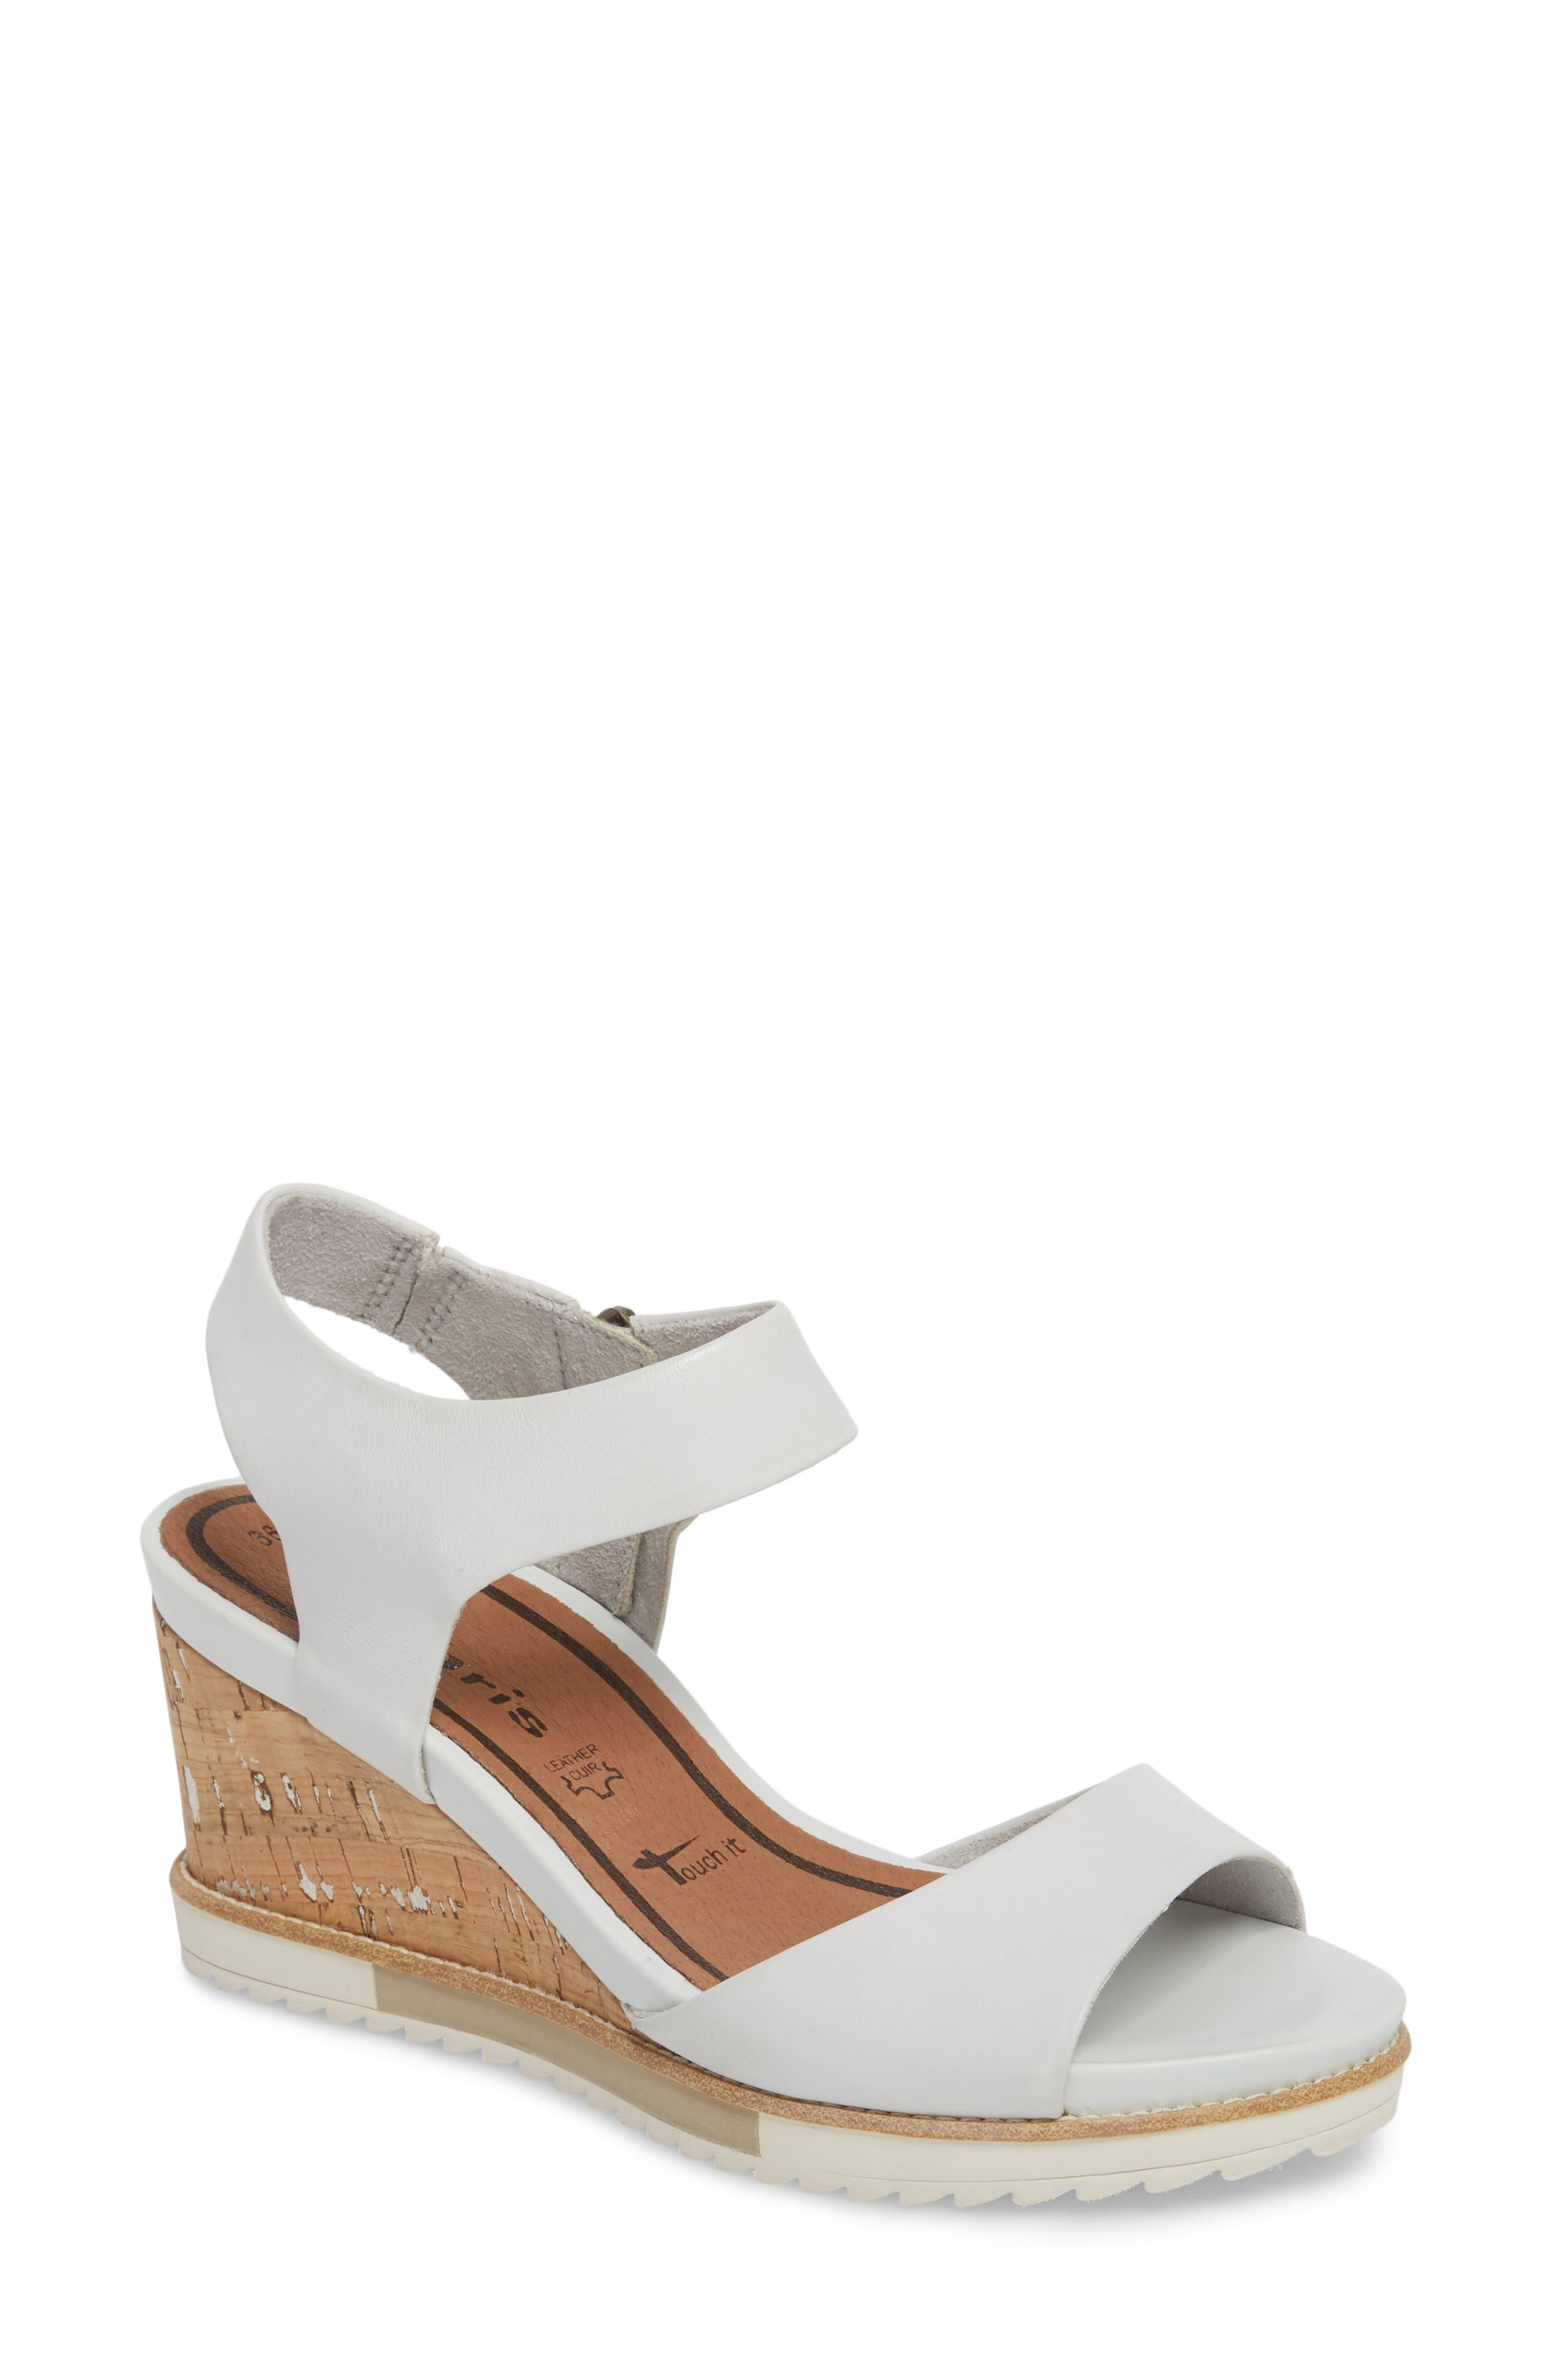 Tamaris 'Alis' Lug Sole Wedge Sandal (Women)